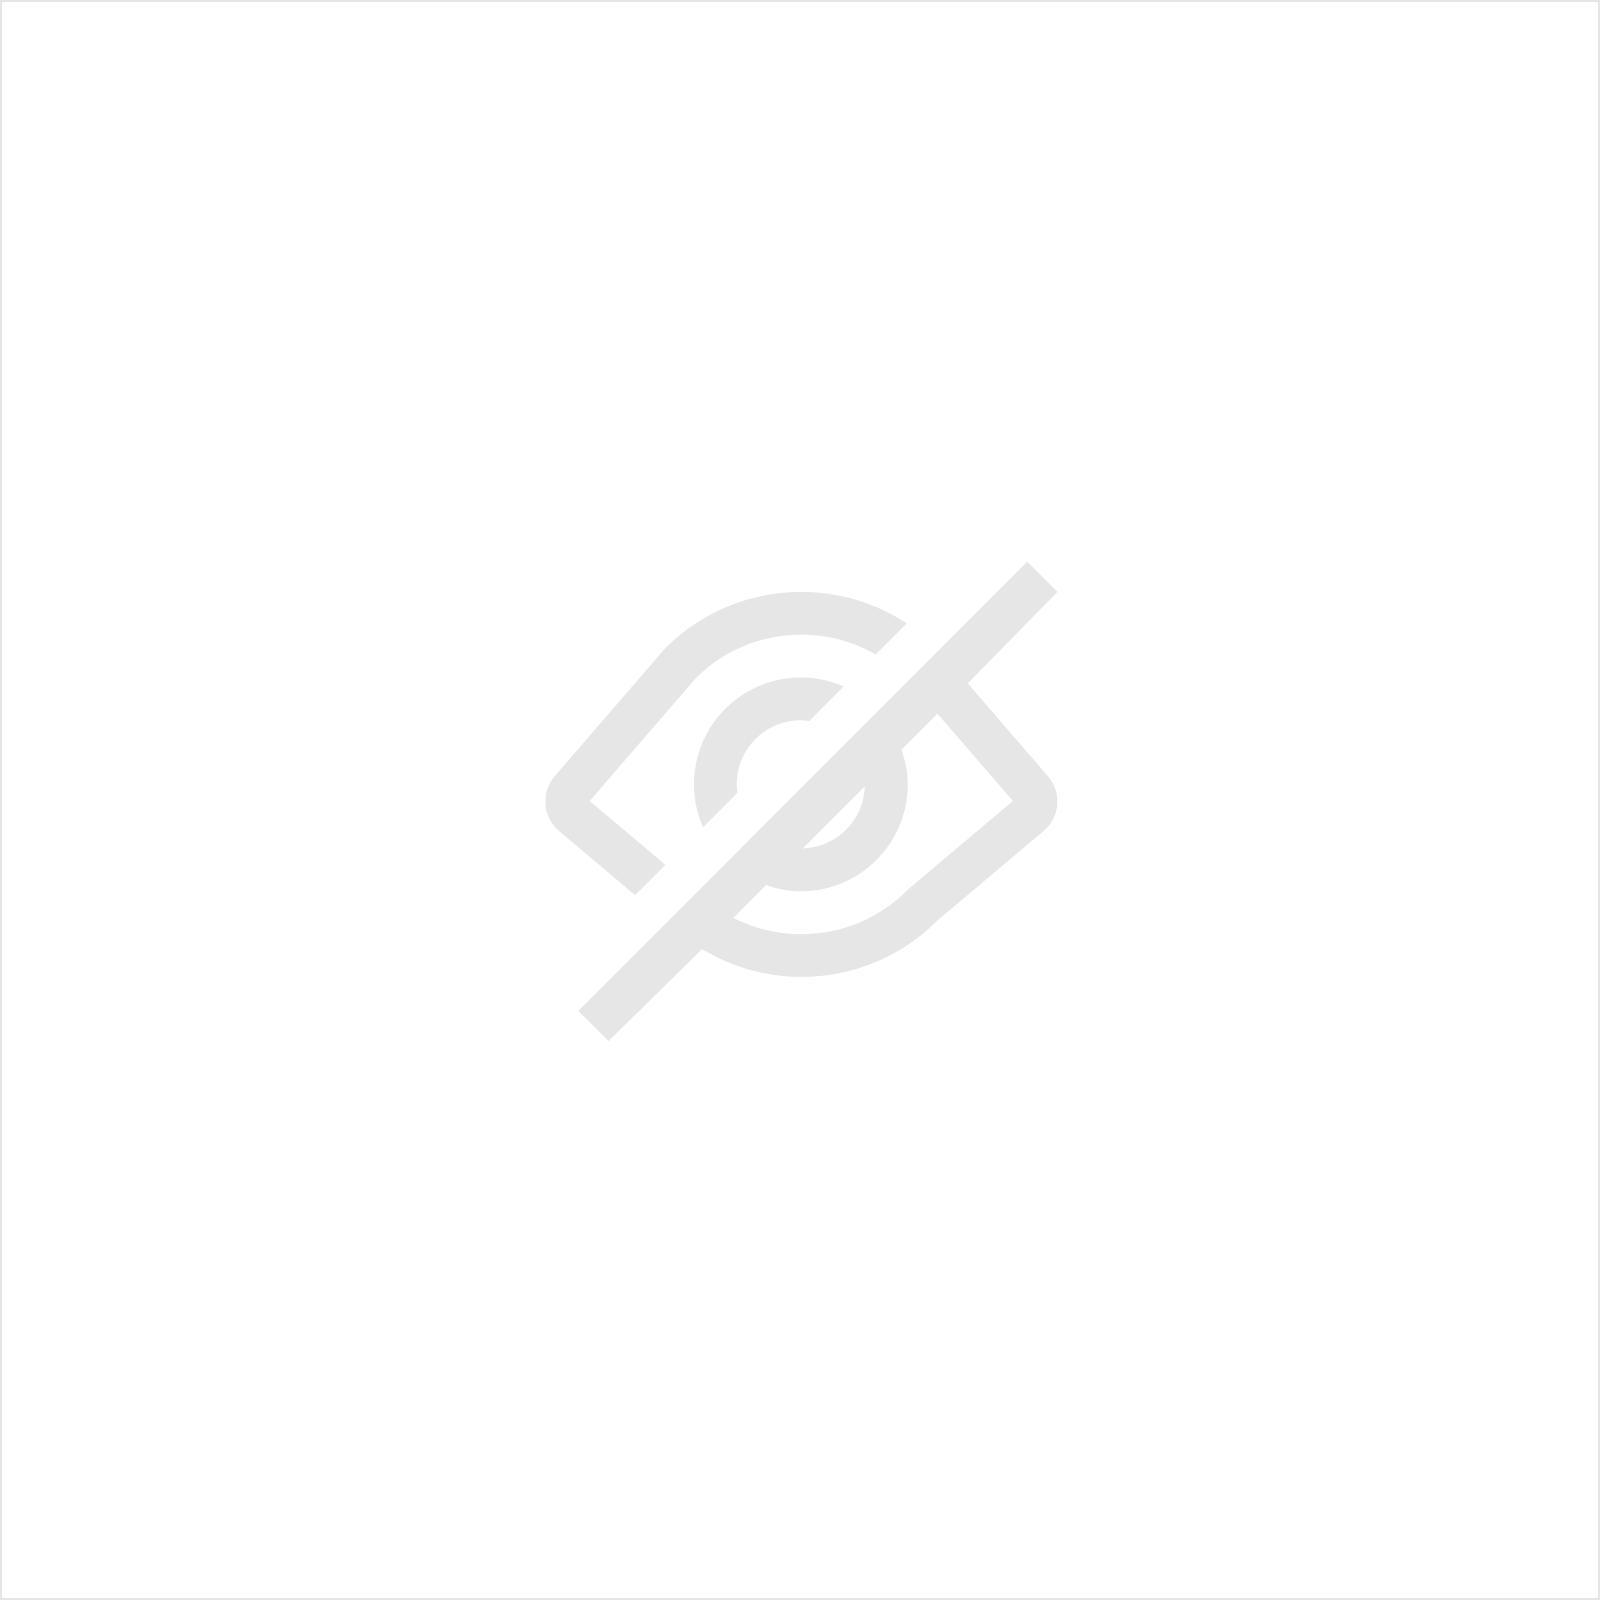 AUTOHOES SUPERTEX LUXE BINNENHOES TYPE F = AUTO < 5,75 M - BLAUW